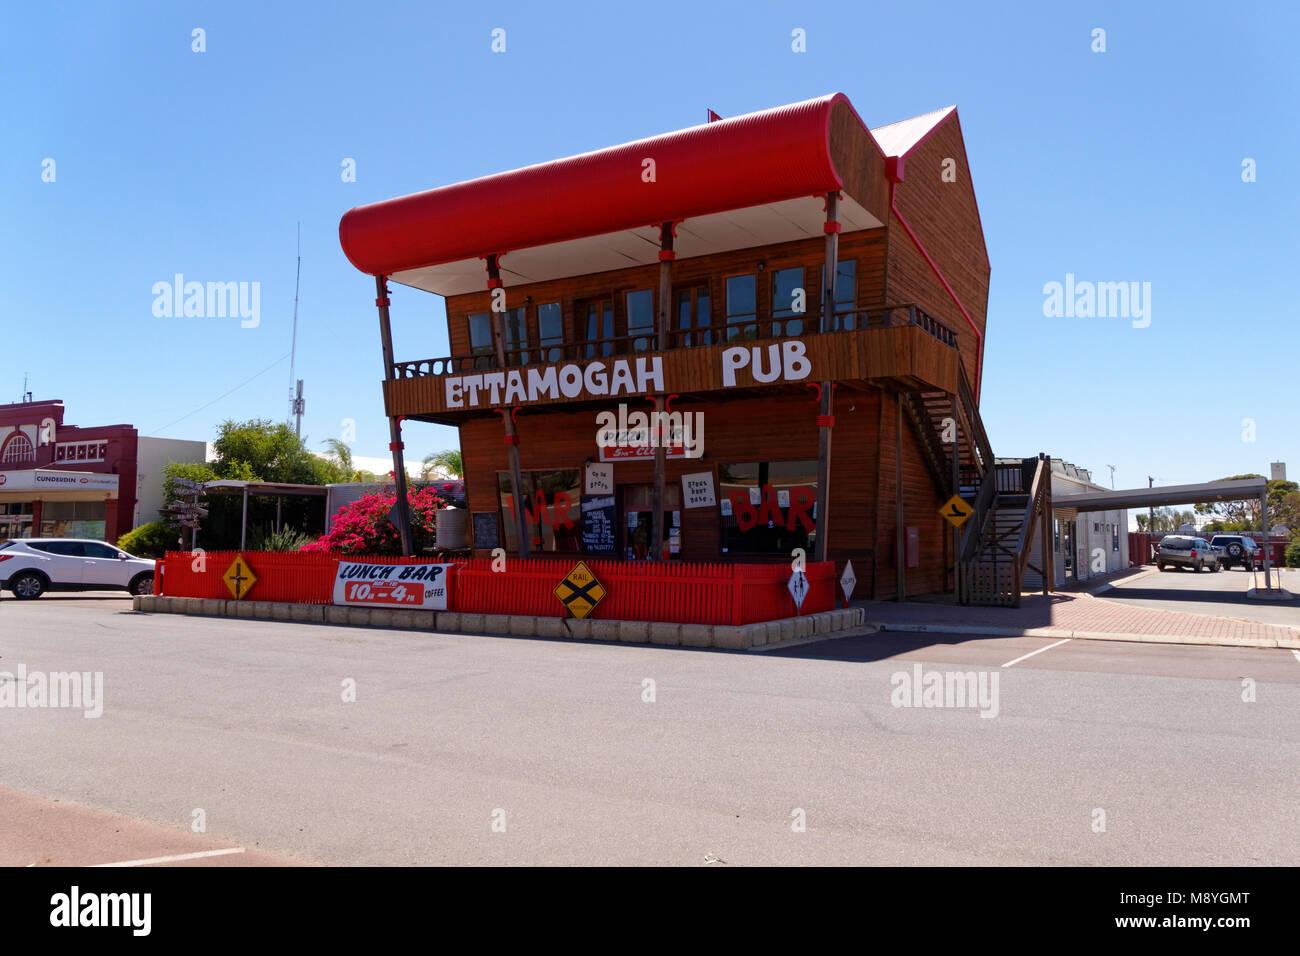 ettamogah pub speed dating